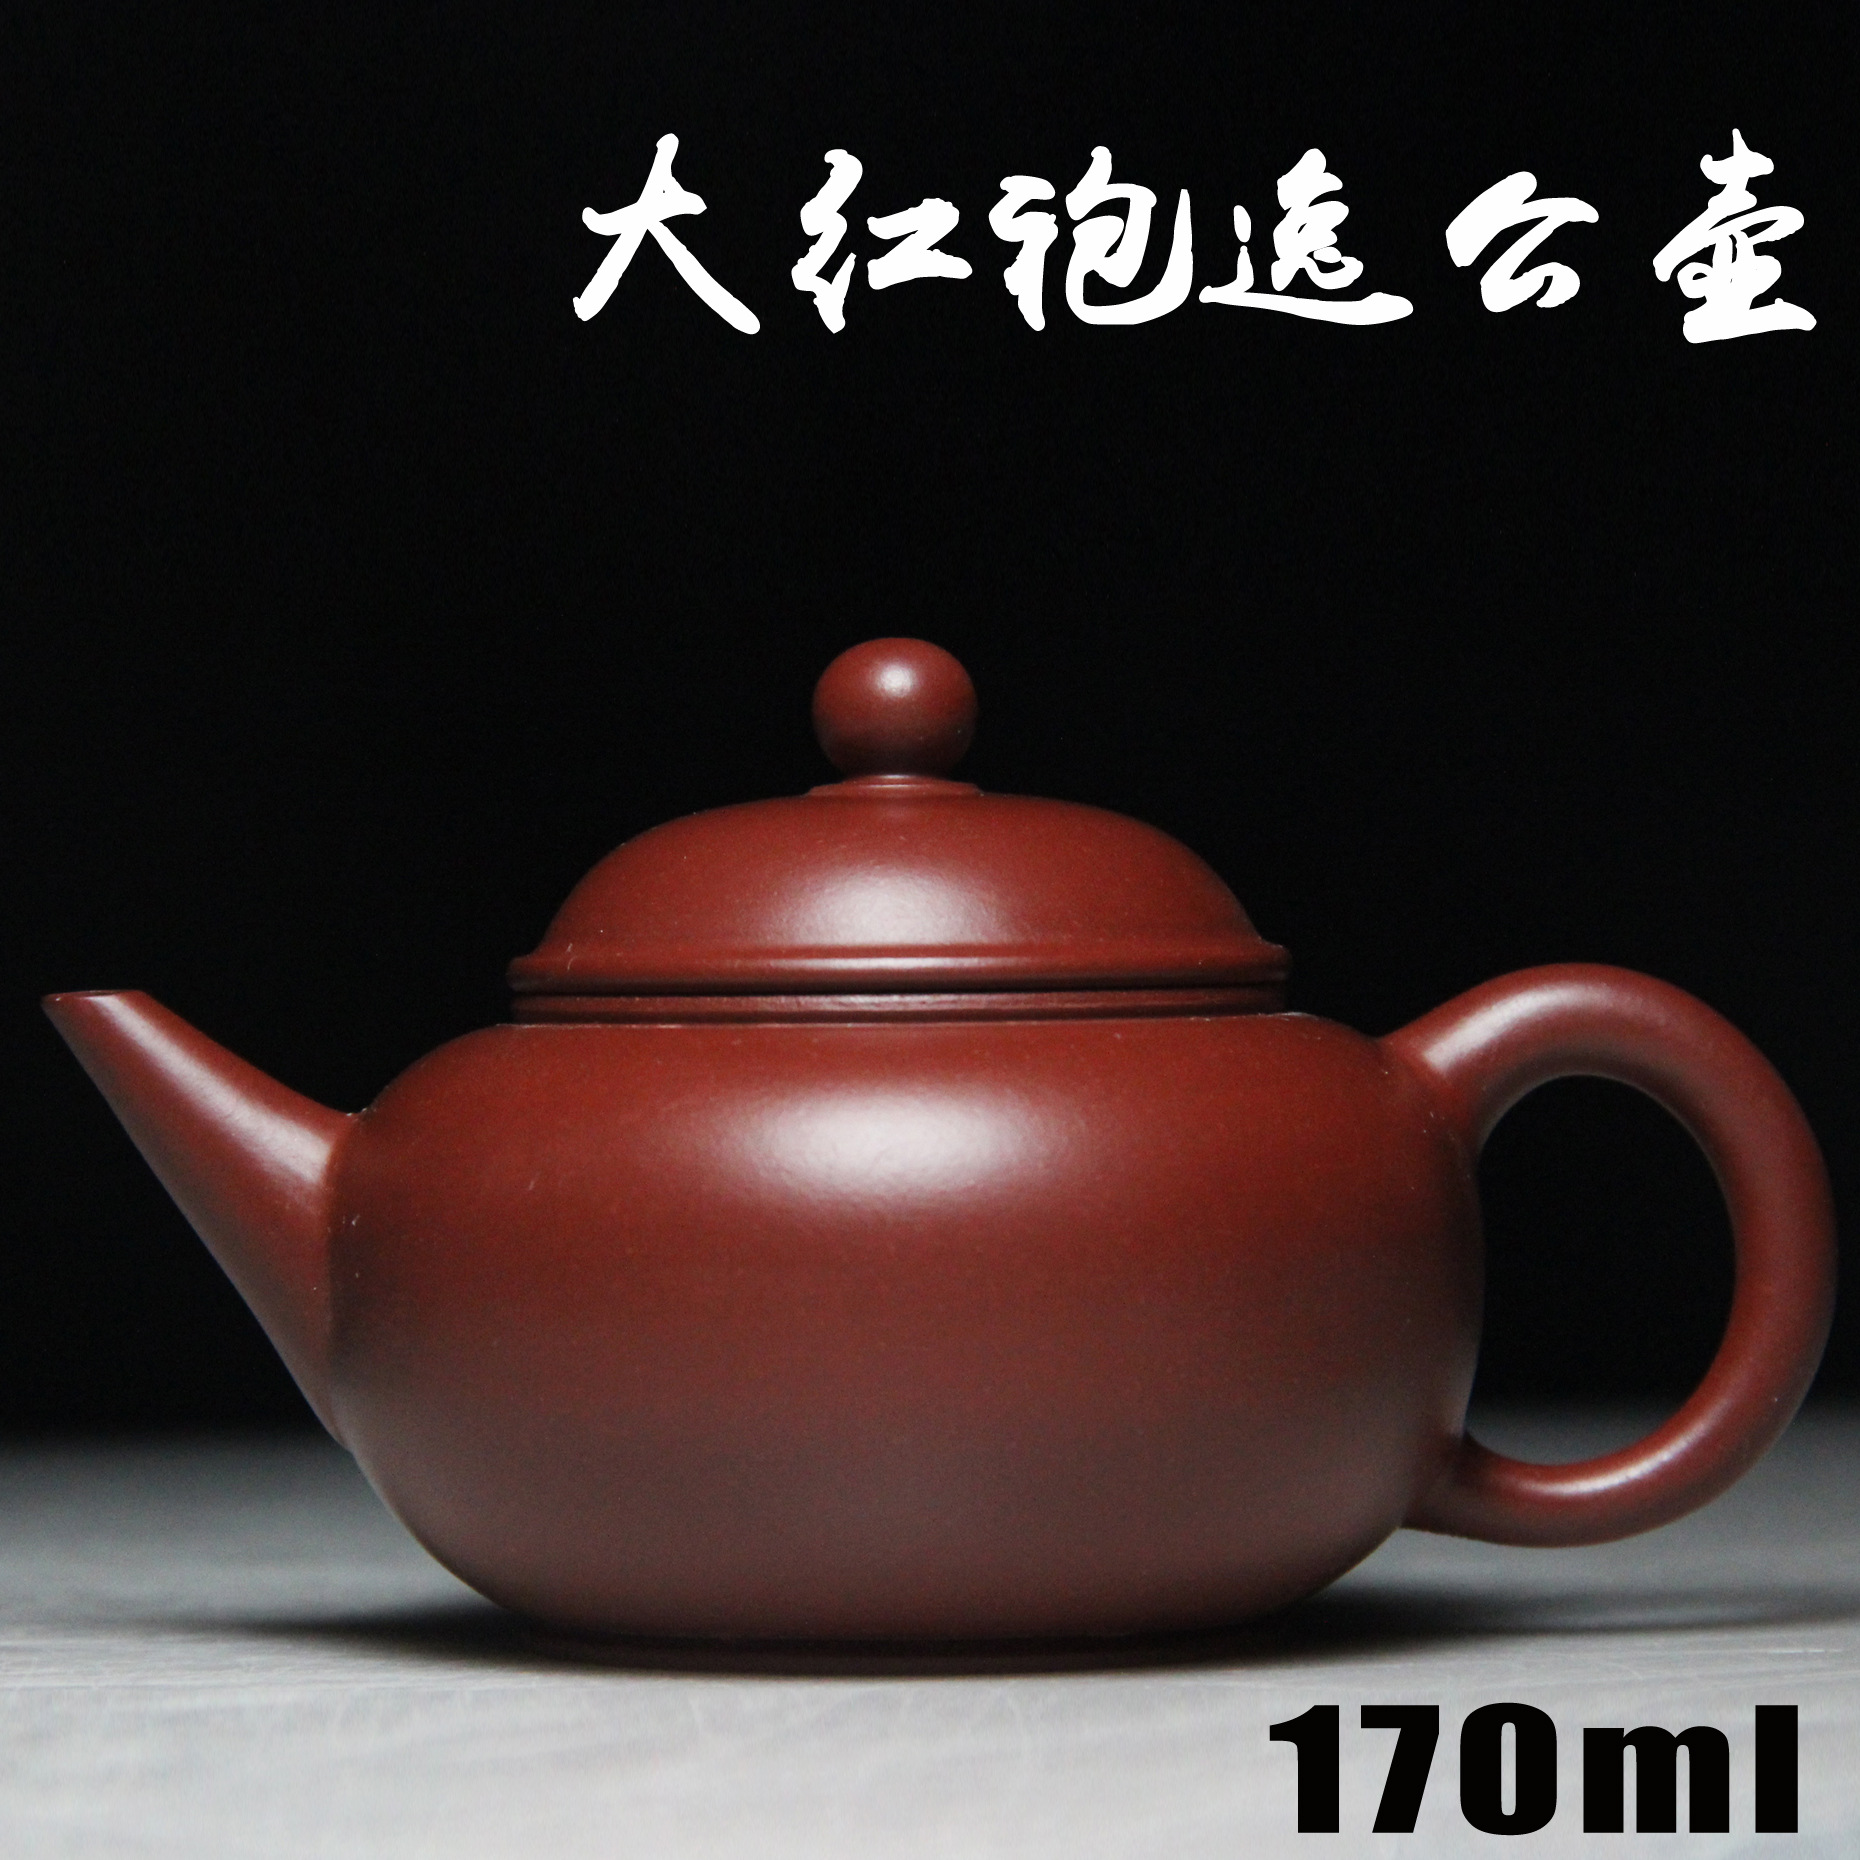 247 Yixing teapot pot authentic masters handmade teapot mud ore Zhu Dahongpao 9 hole